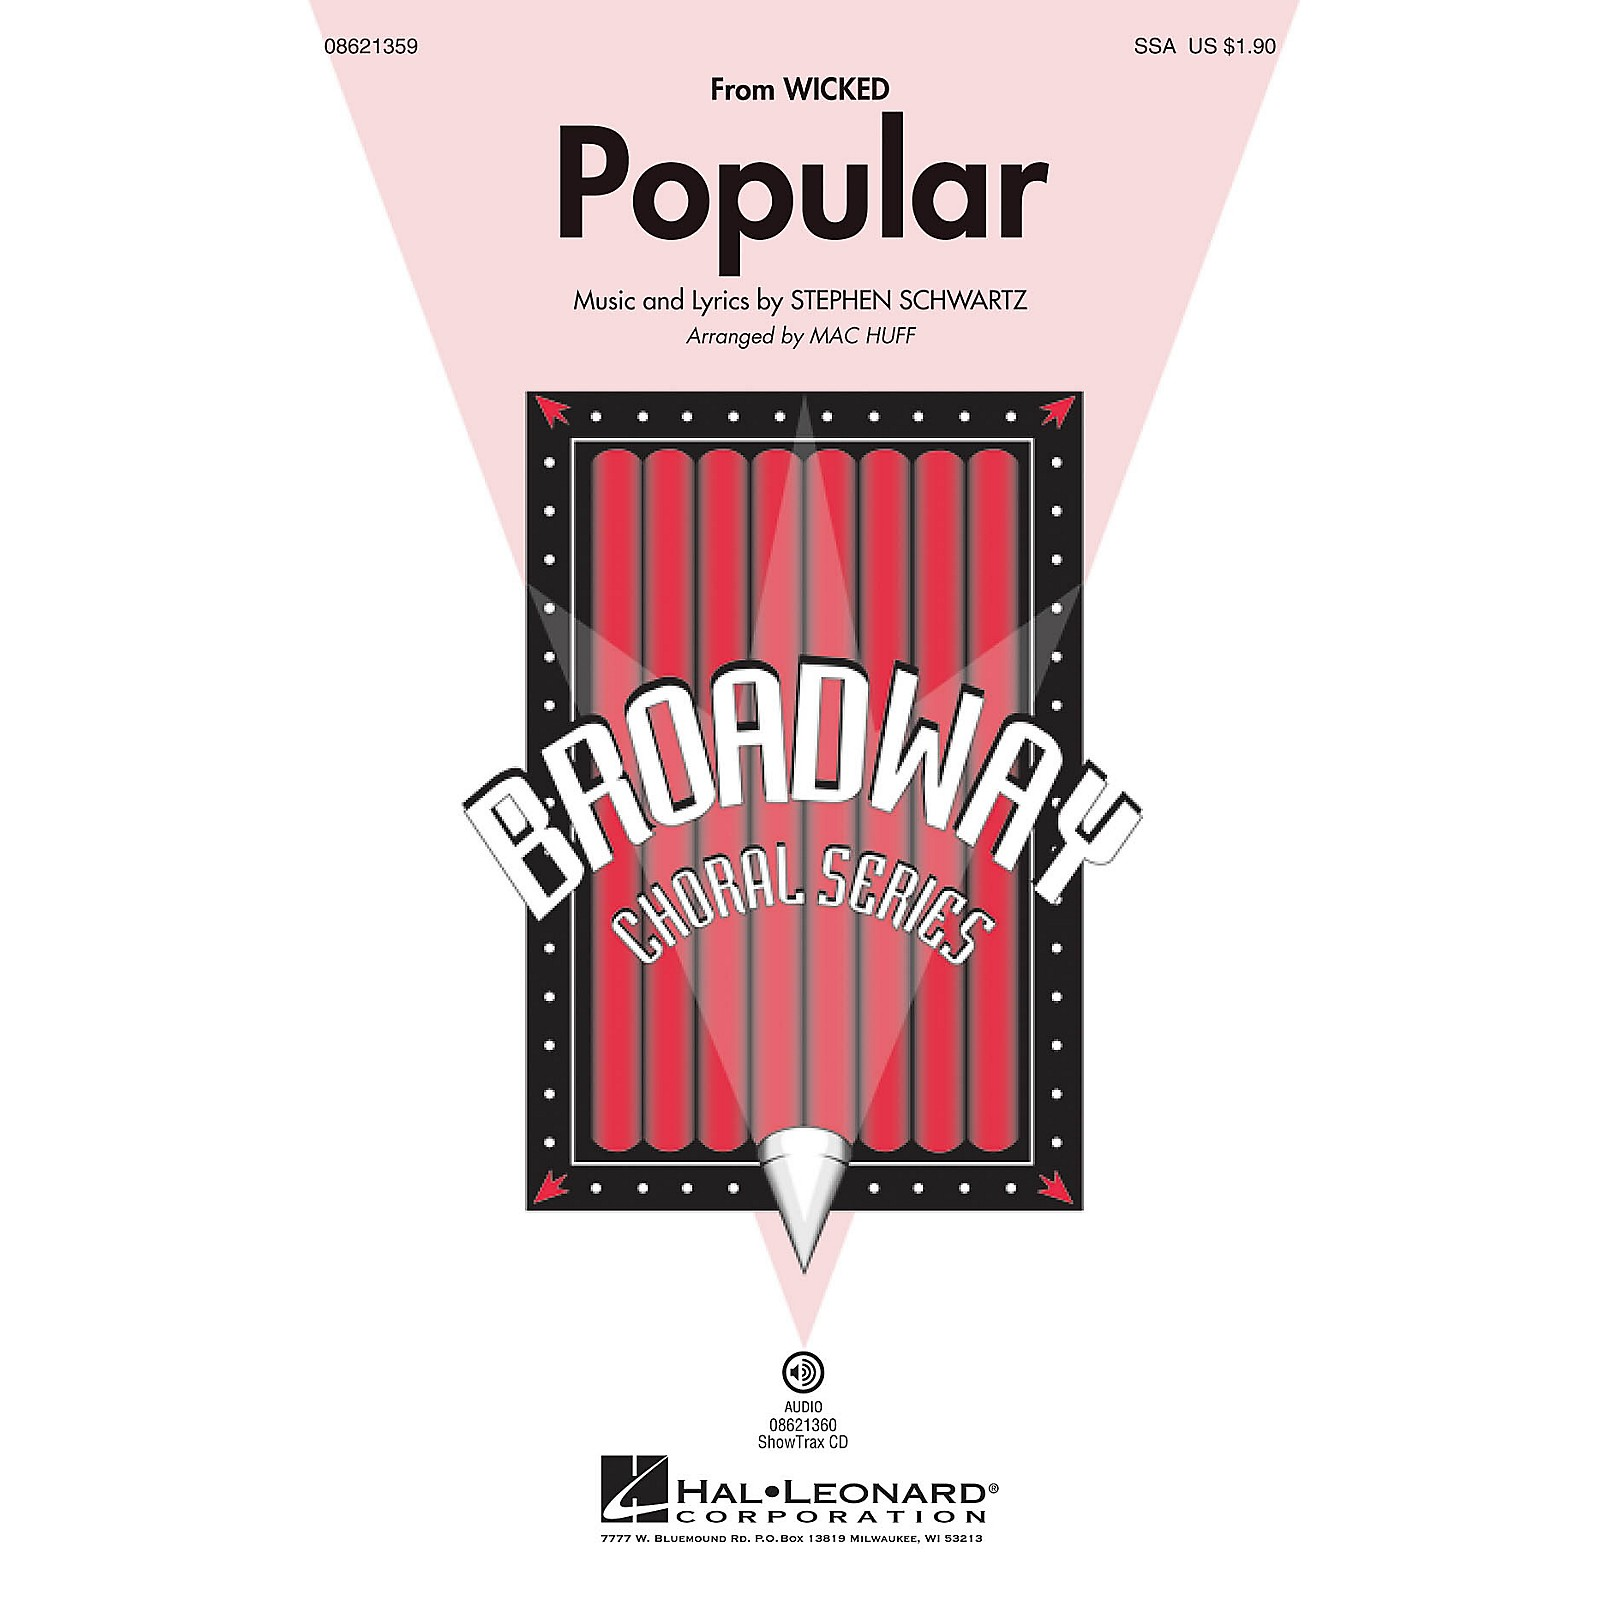 Hal Leonard Popular (from Wicked) SSA arranged by Mac Huff